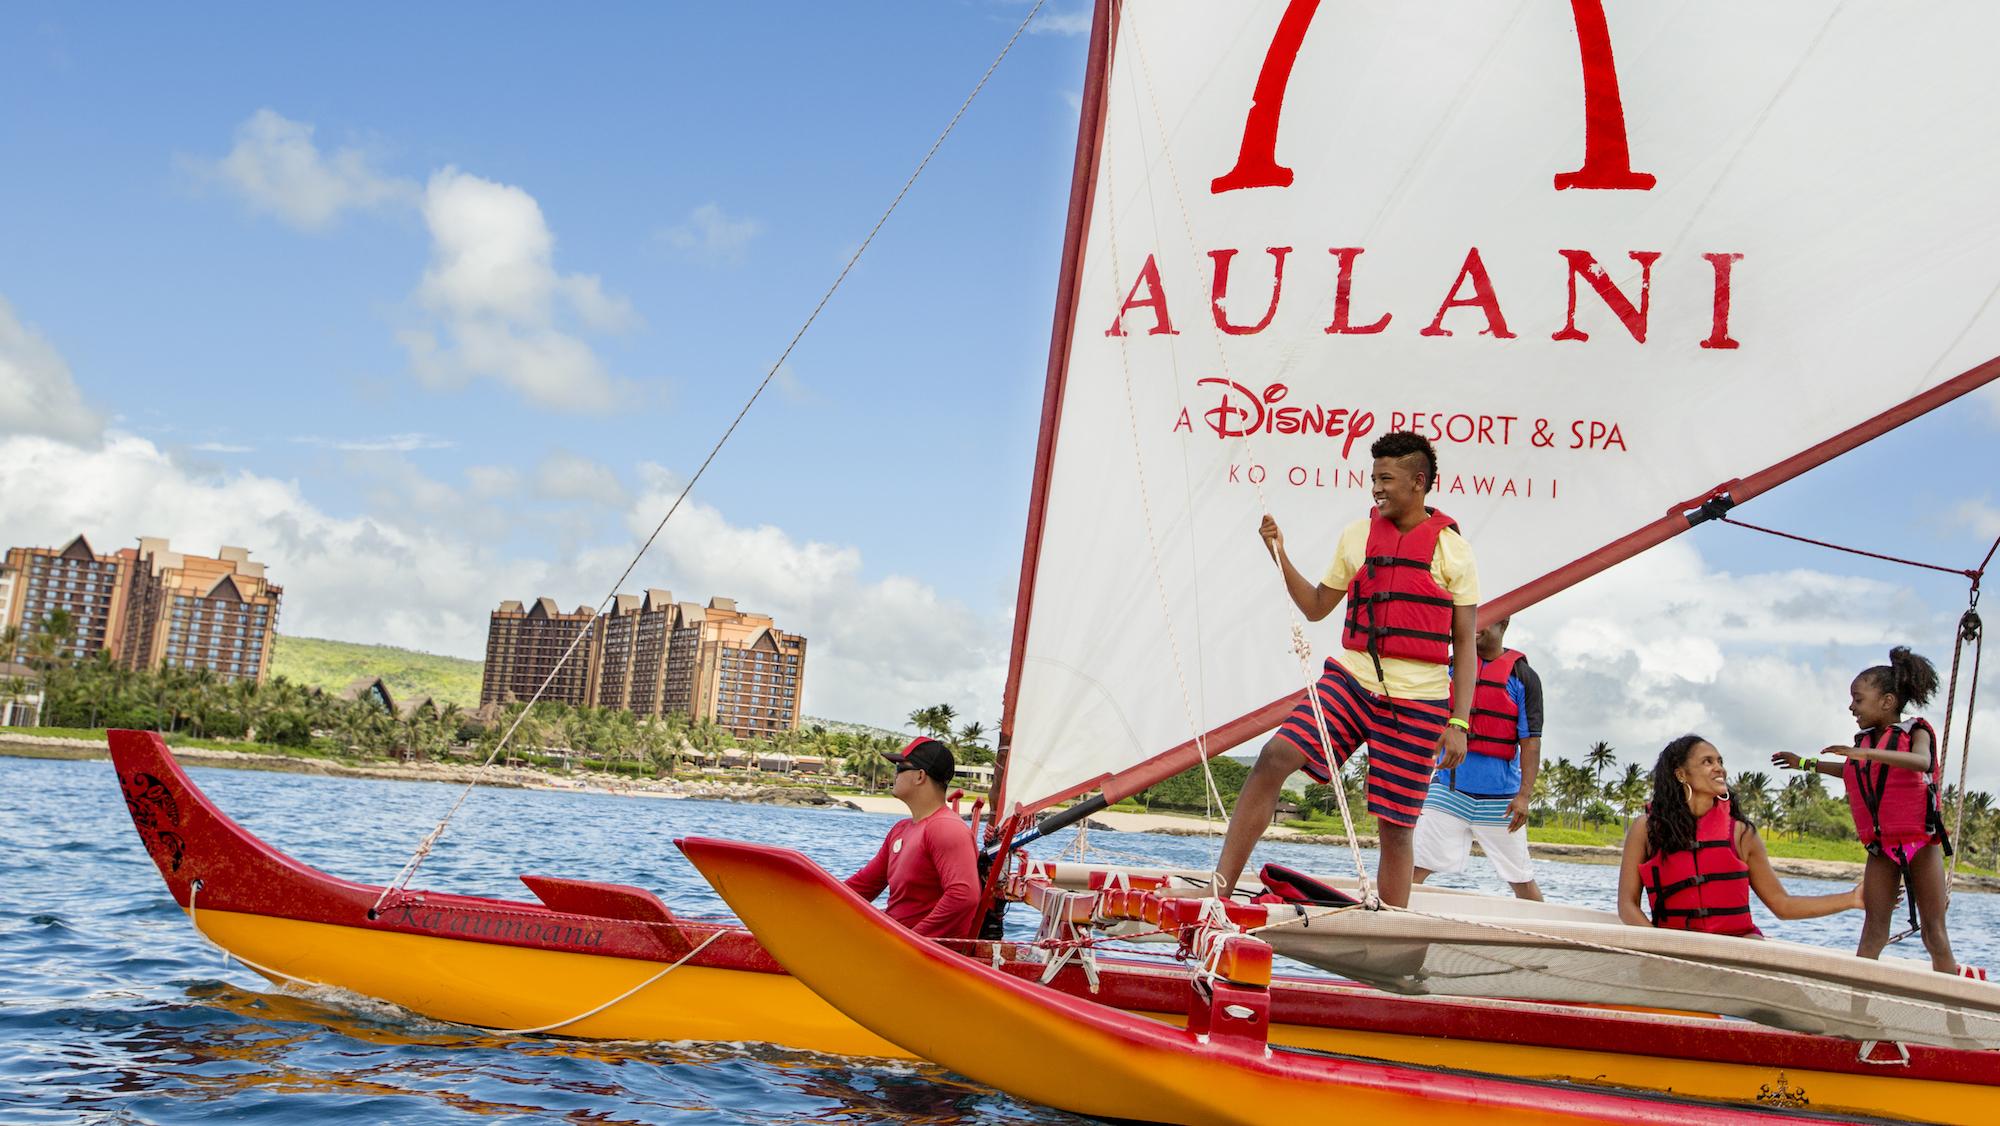 aulani-resort-sailing-disney-hotel-and-s